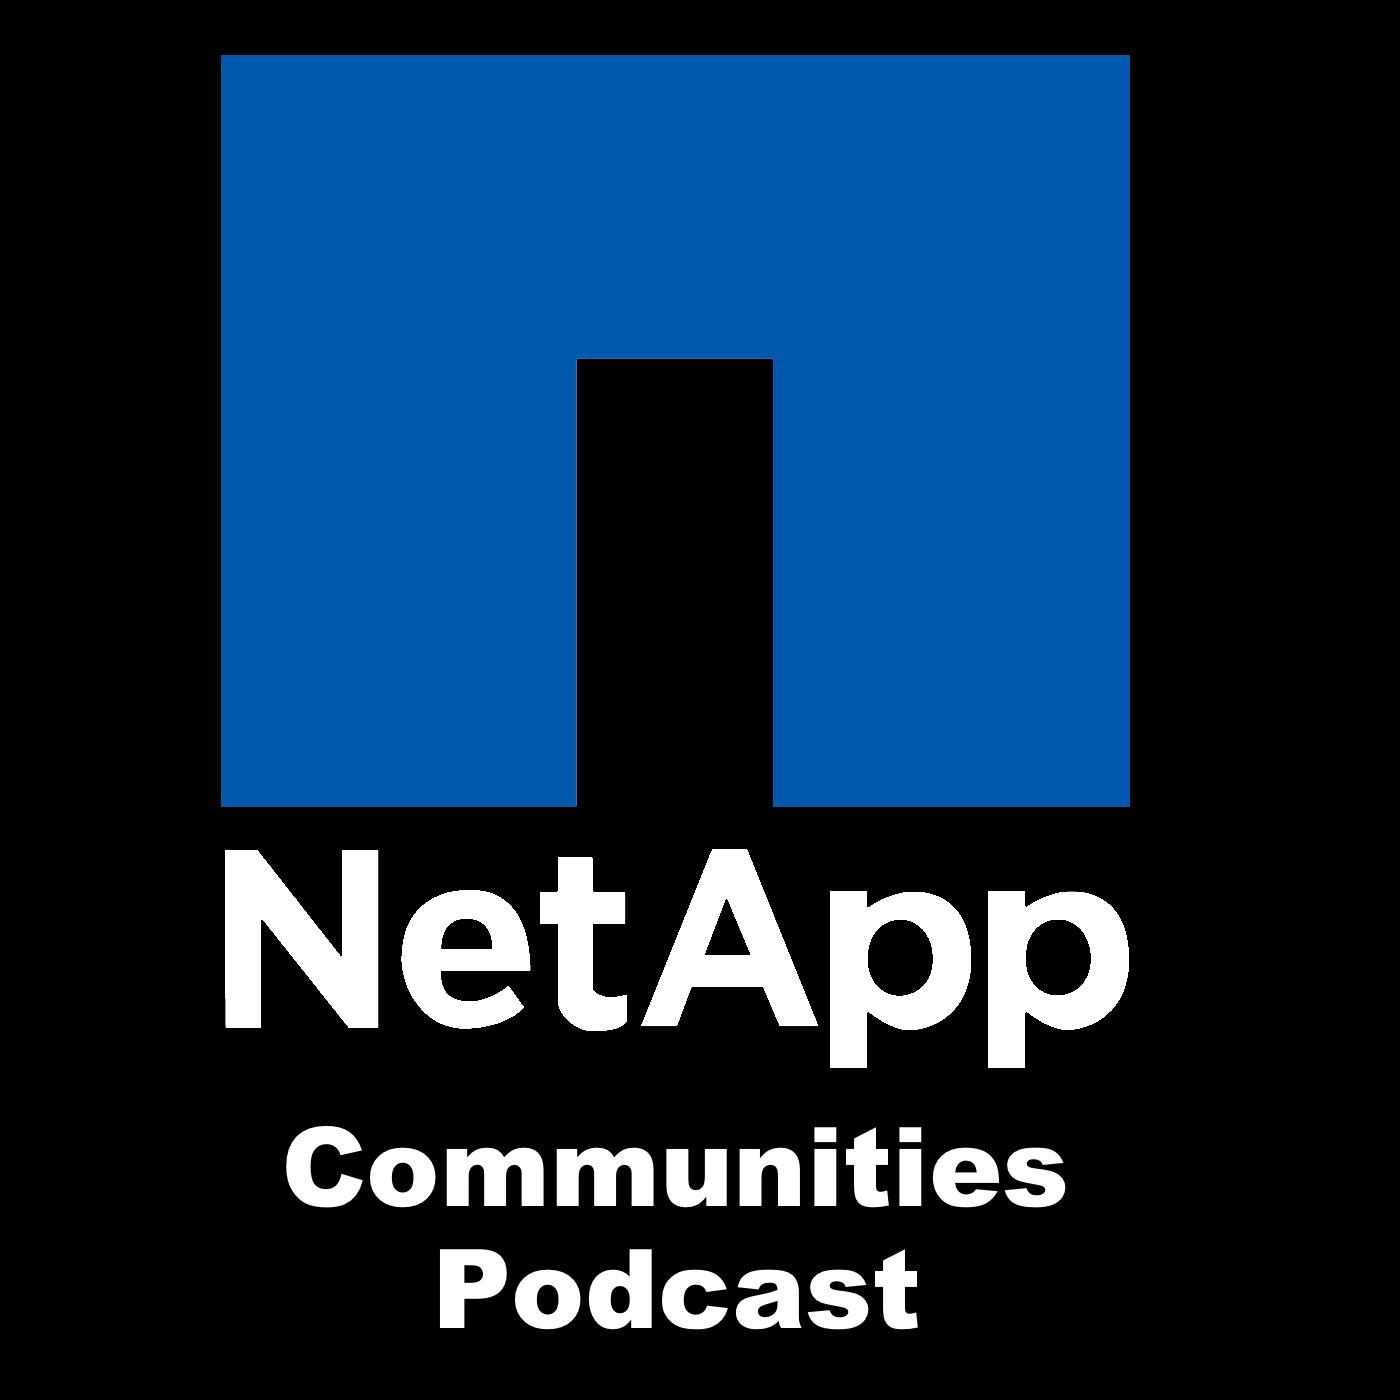 NetApp Communities Podcast